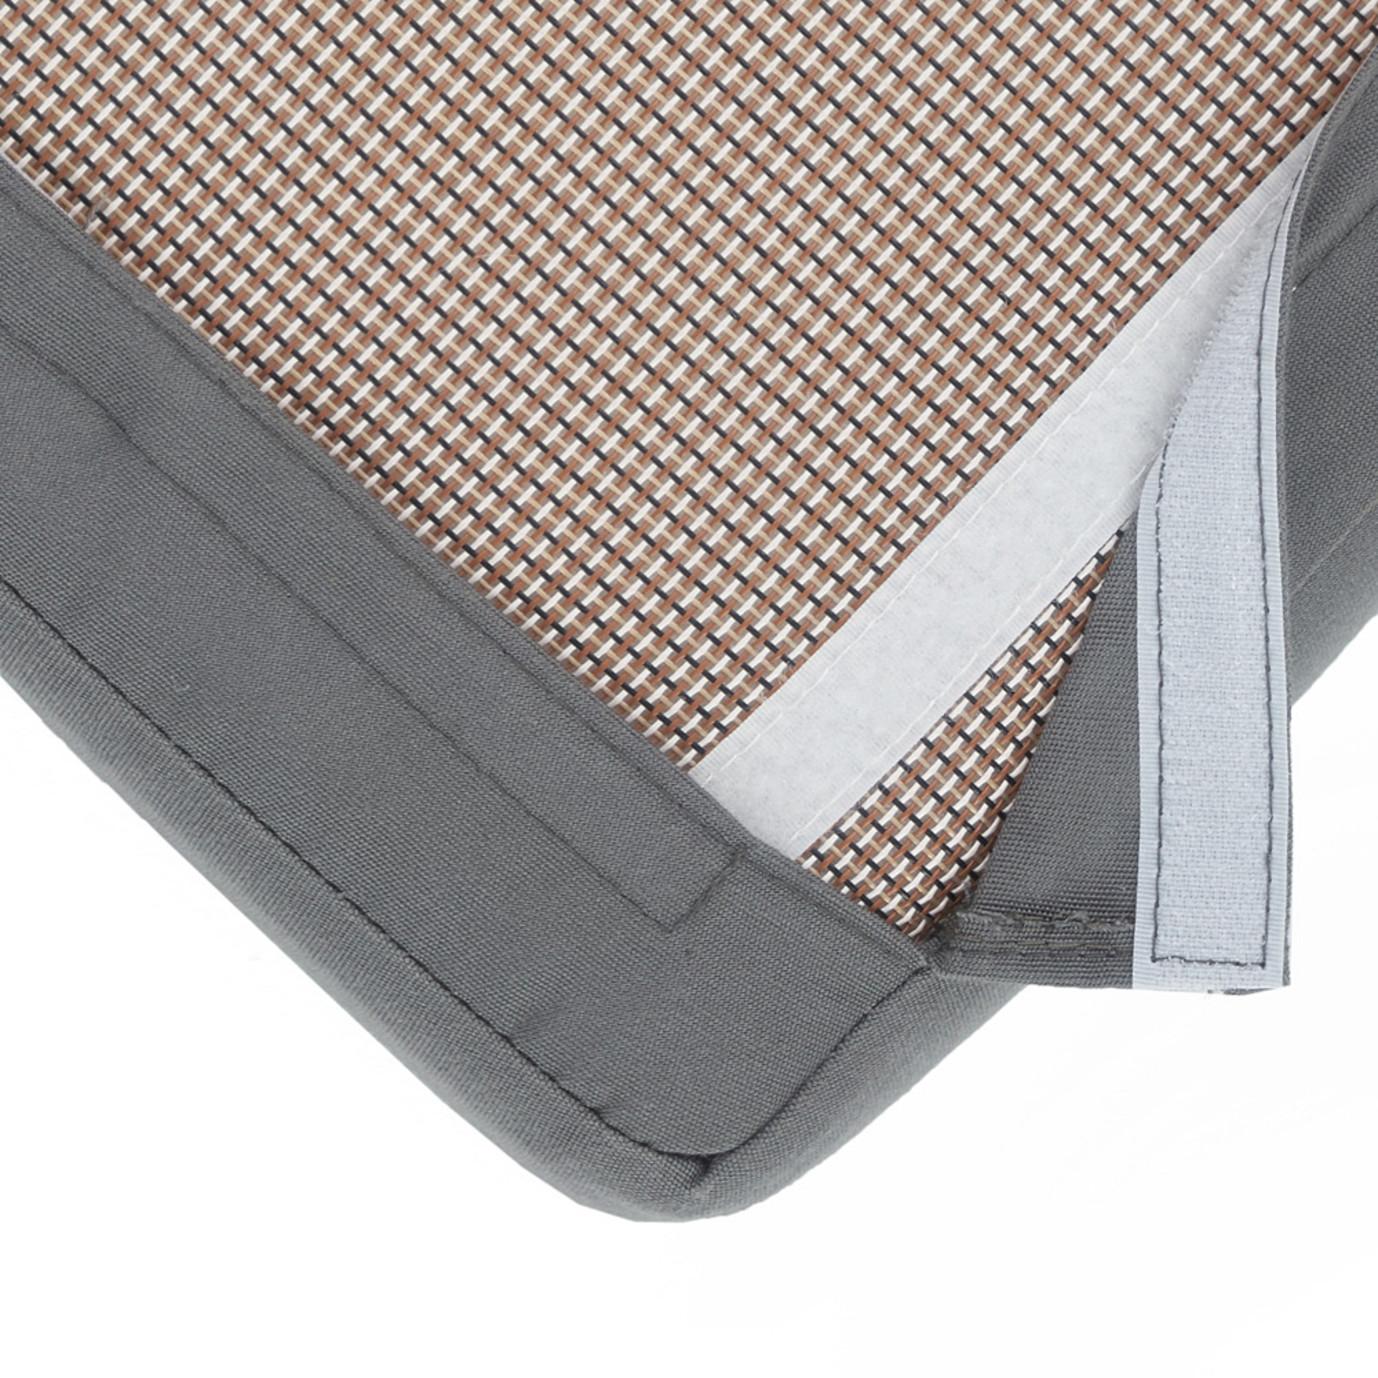 Milo™ Grey 4pc Motion Fire Set - Charcoal Grey